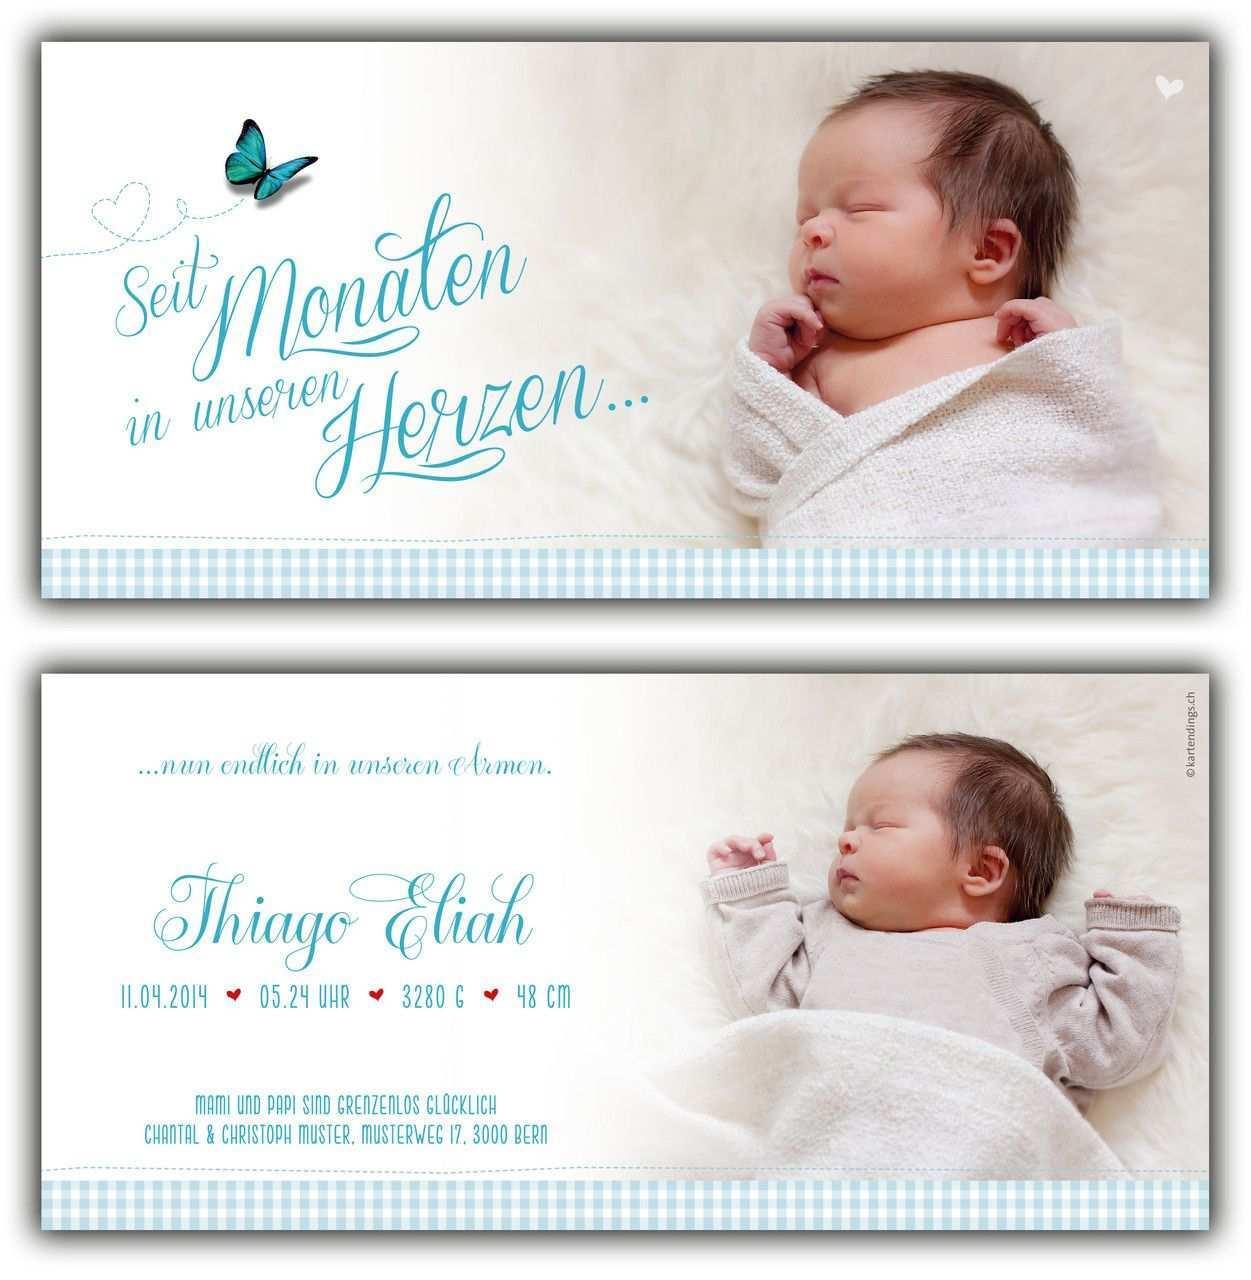 2 Seitig Kartendings Das Ding Fur Kartendesign Geburtskarte Geburtsanzeige Dankeskarte Geburtskarten Geburtsanzeigen Kreative Geburtskarten